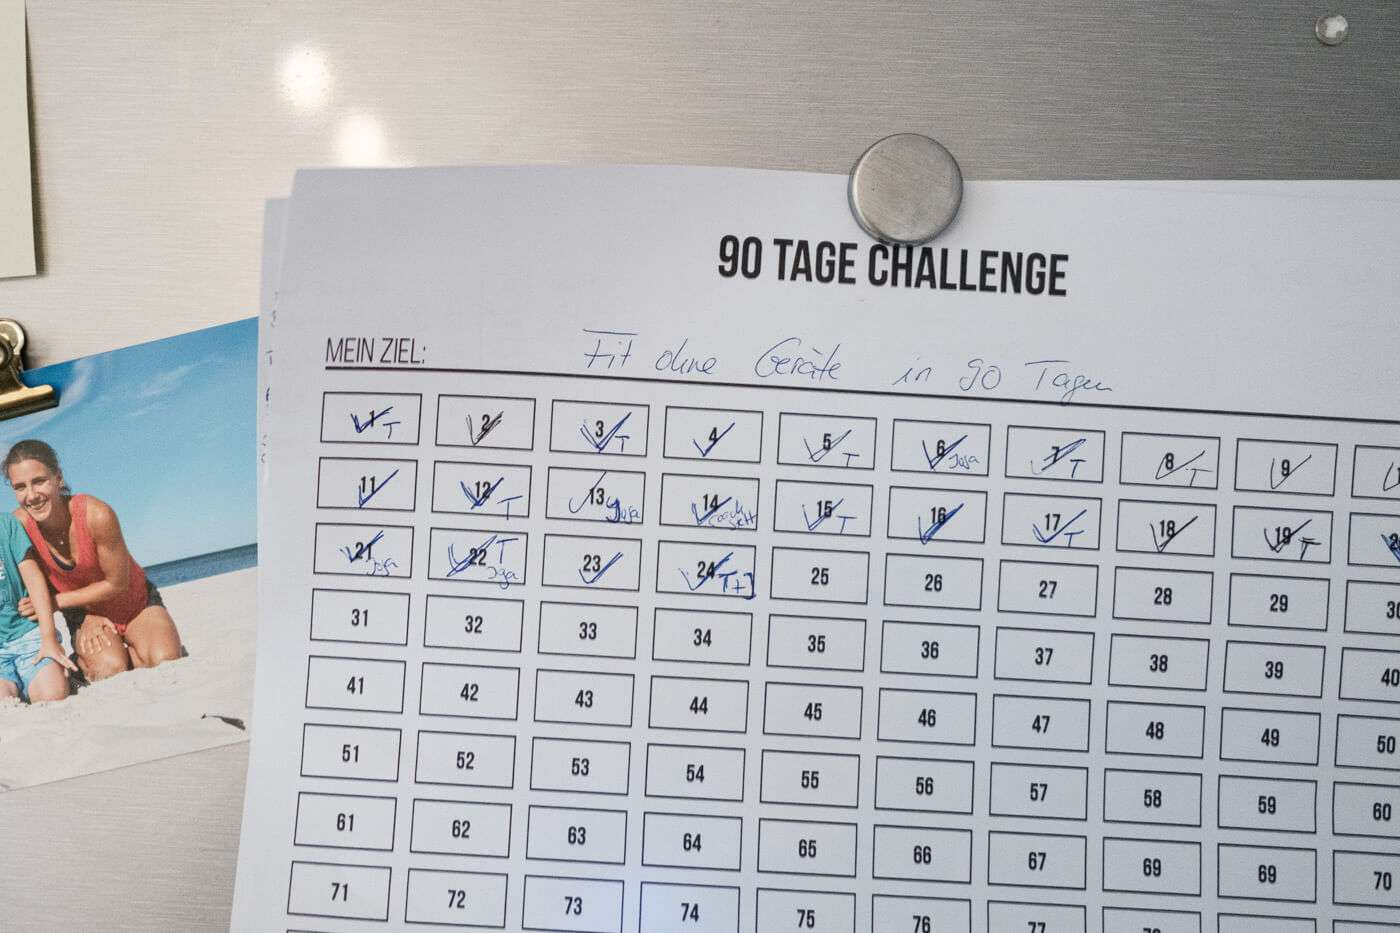 90 tage challenge 01